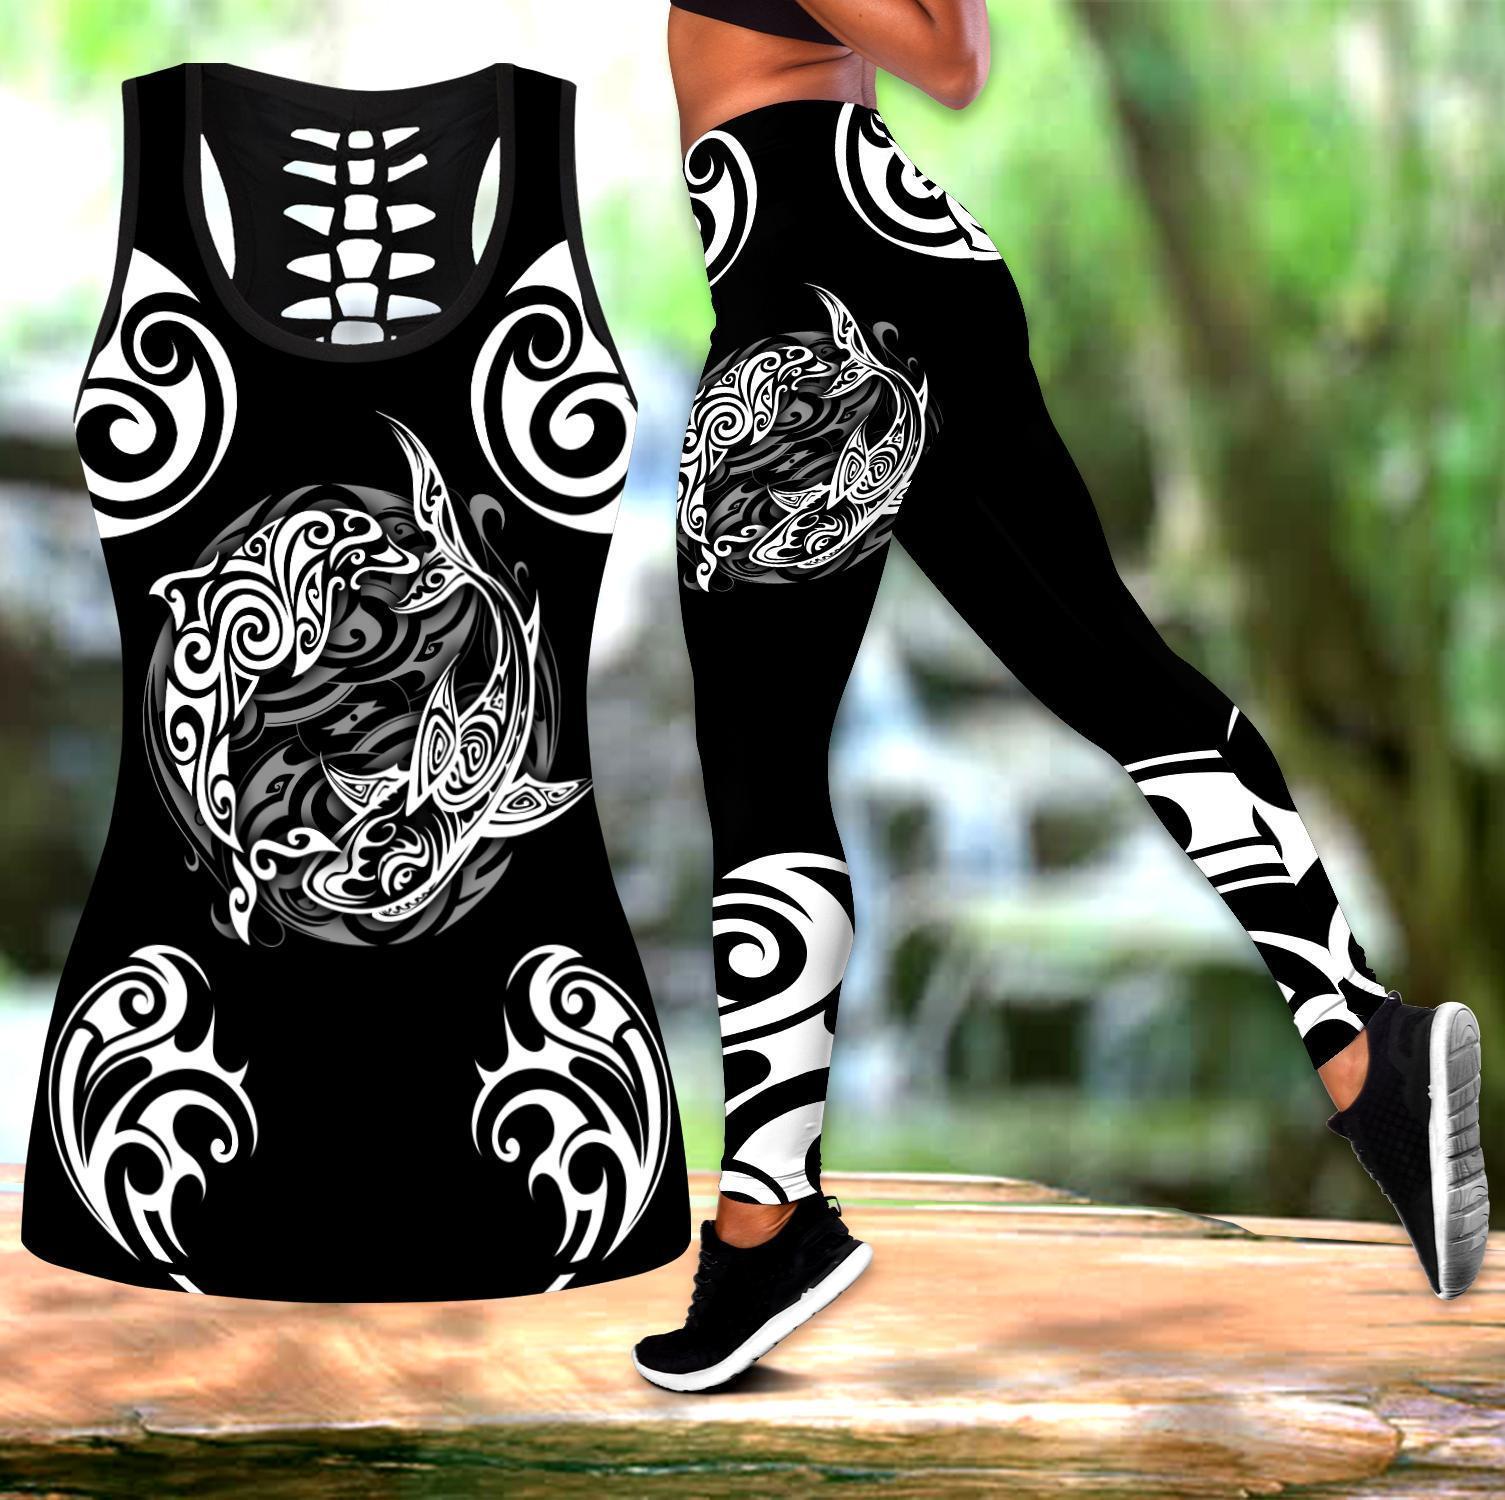 Pohnpei Polynesian Culture Tribe Shark Tattoo 3D All Over Printed Legging & Tank top Sexy Elastic Female Skinny Leggings DDK31